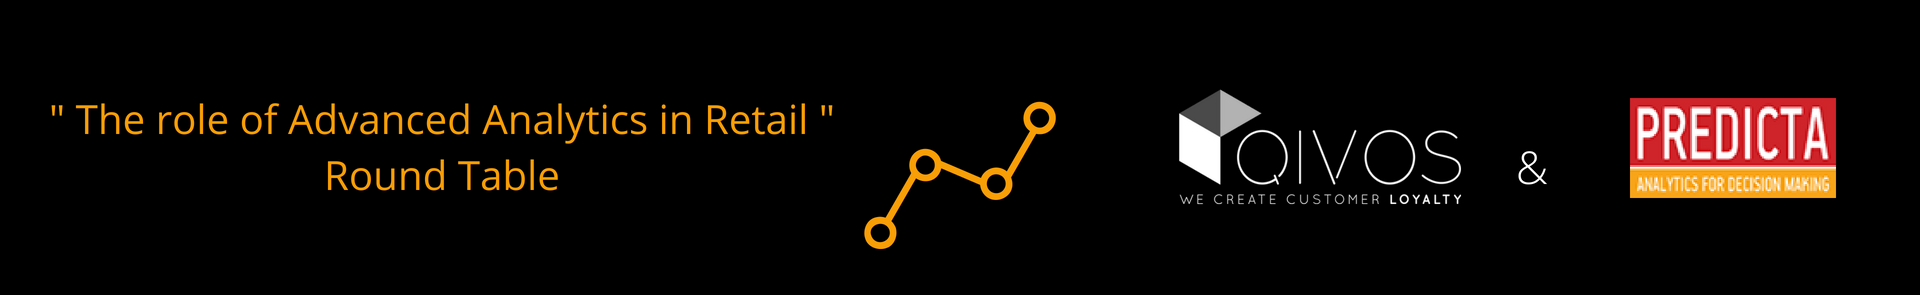 QIVOS and PREDICTA event - Advanced Analytics